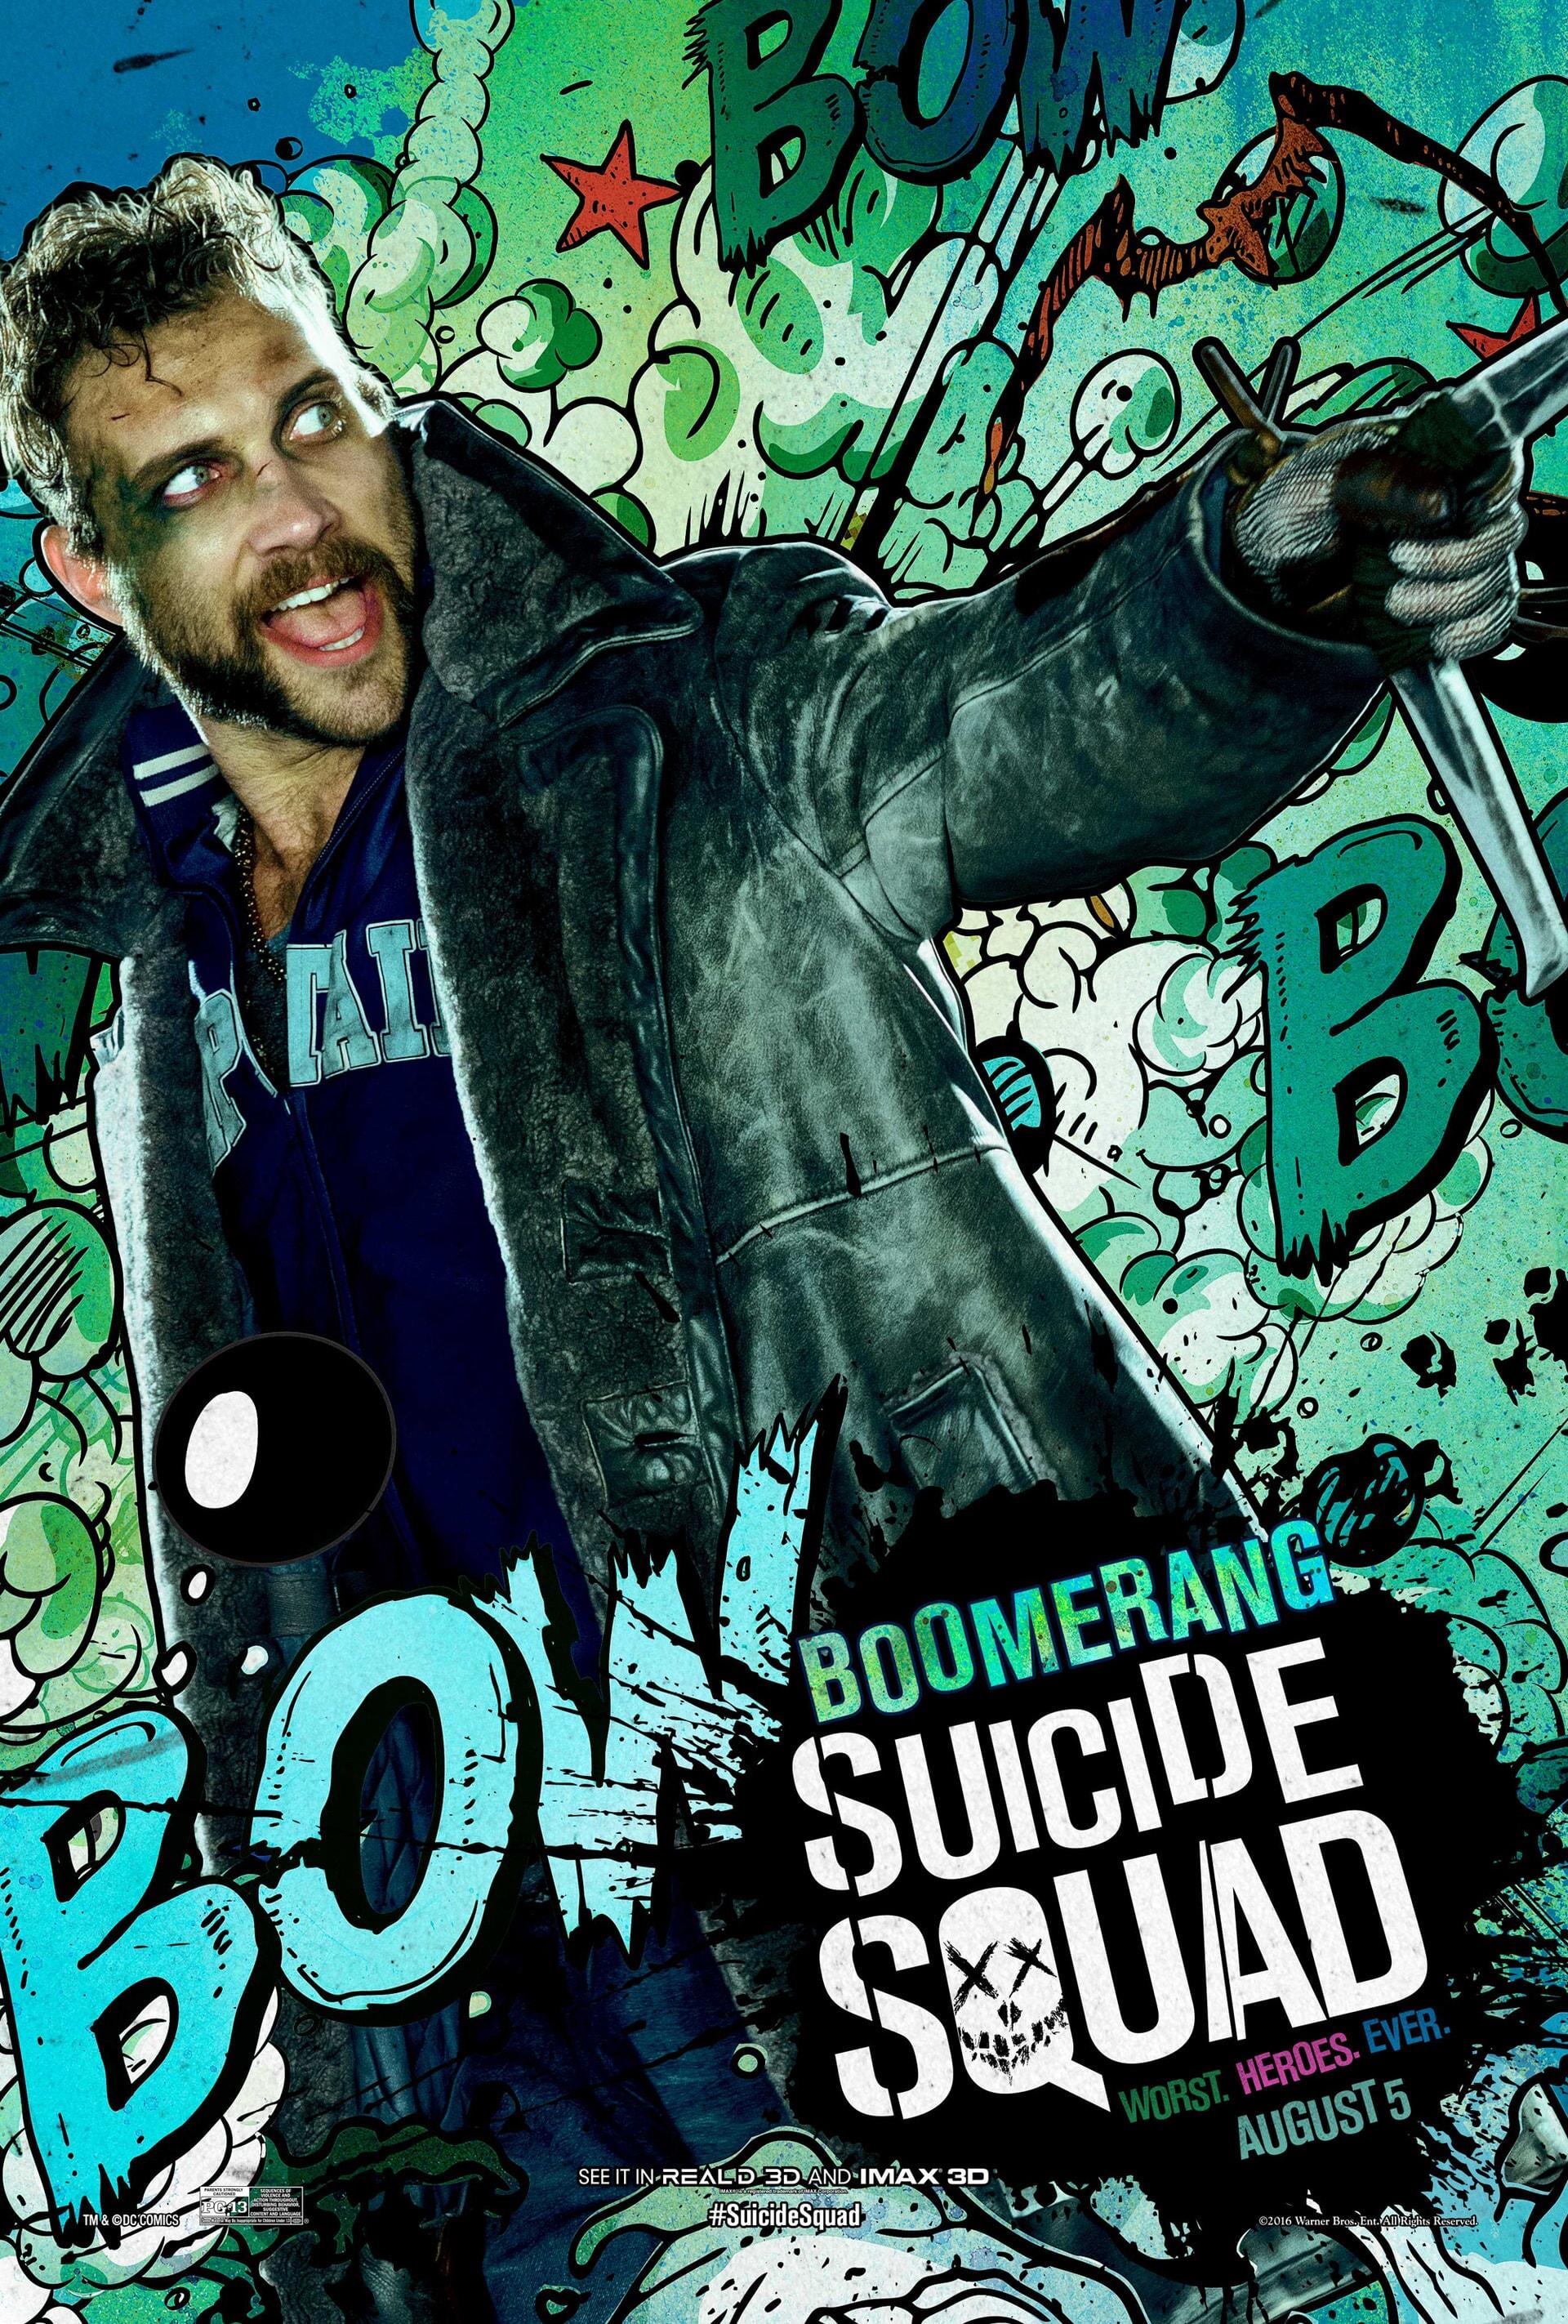 Suicide Squad - Boomerang